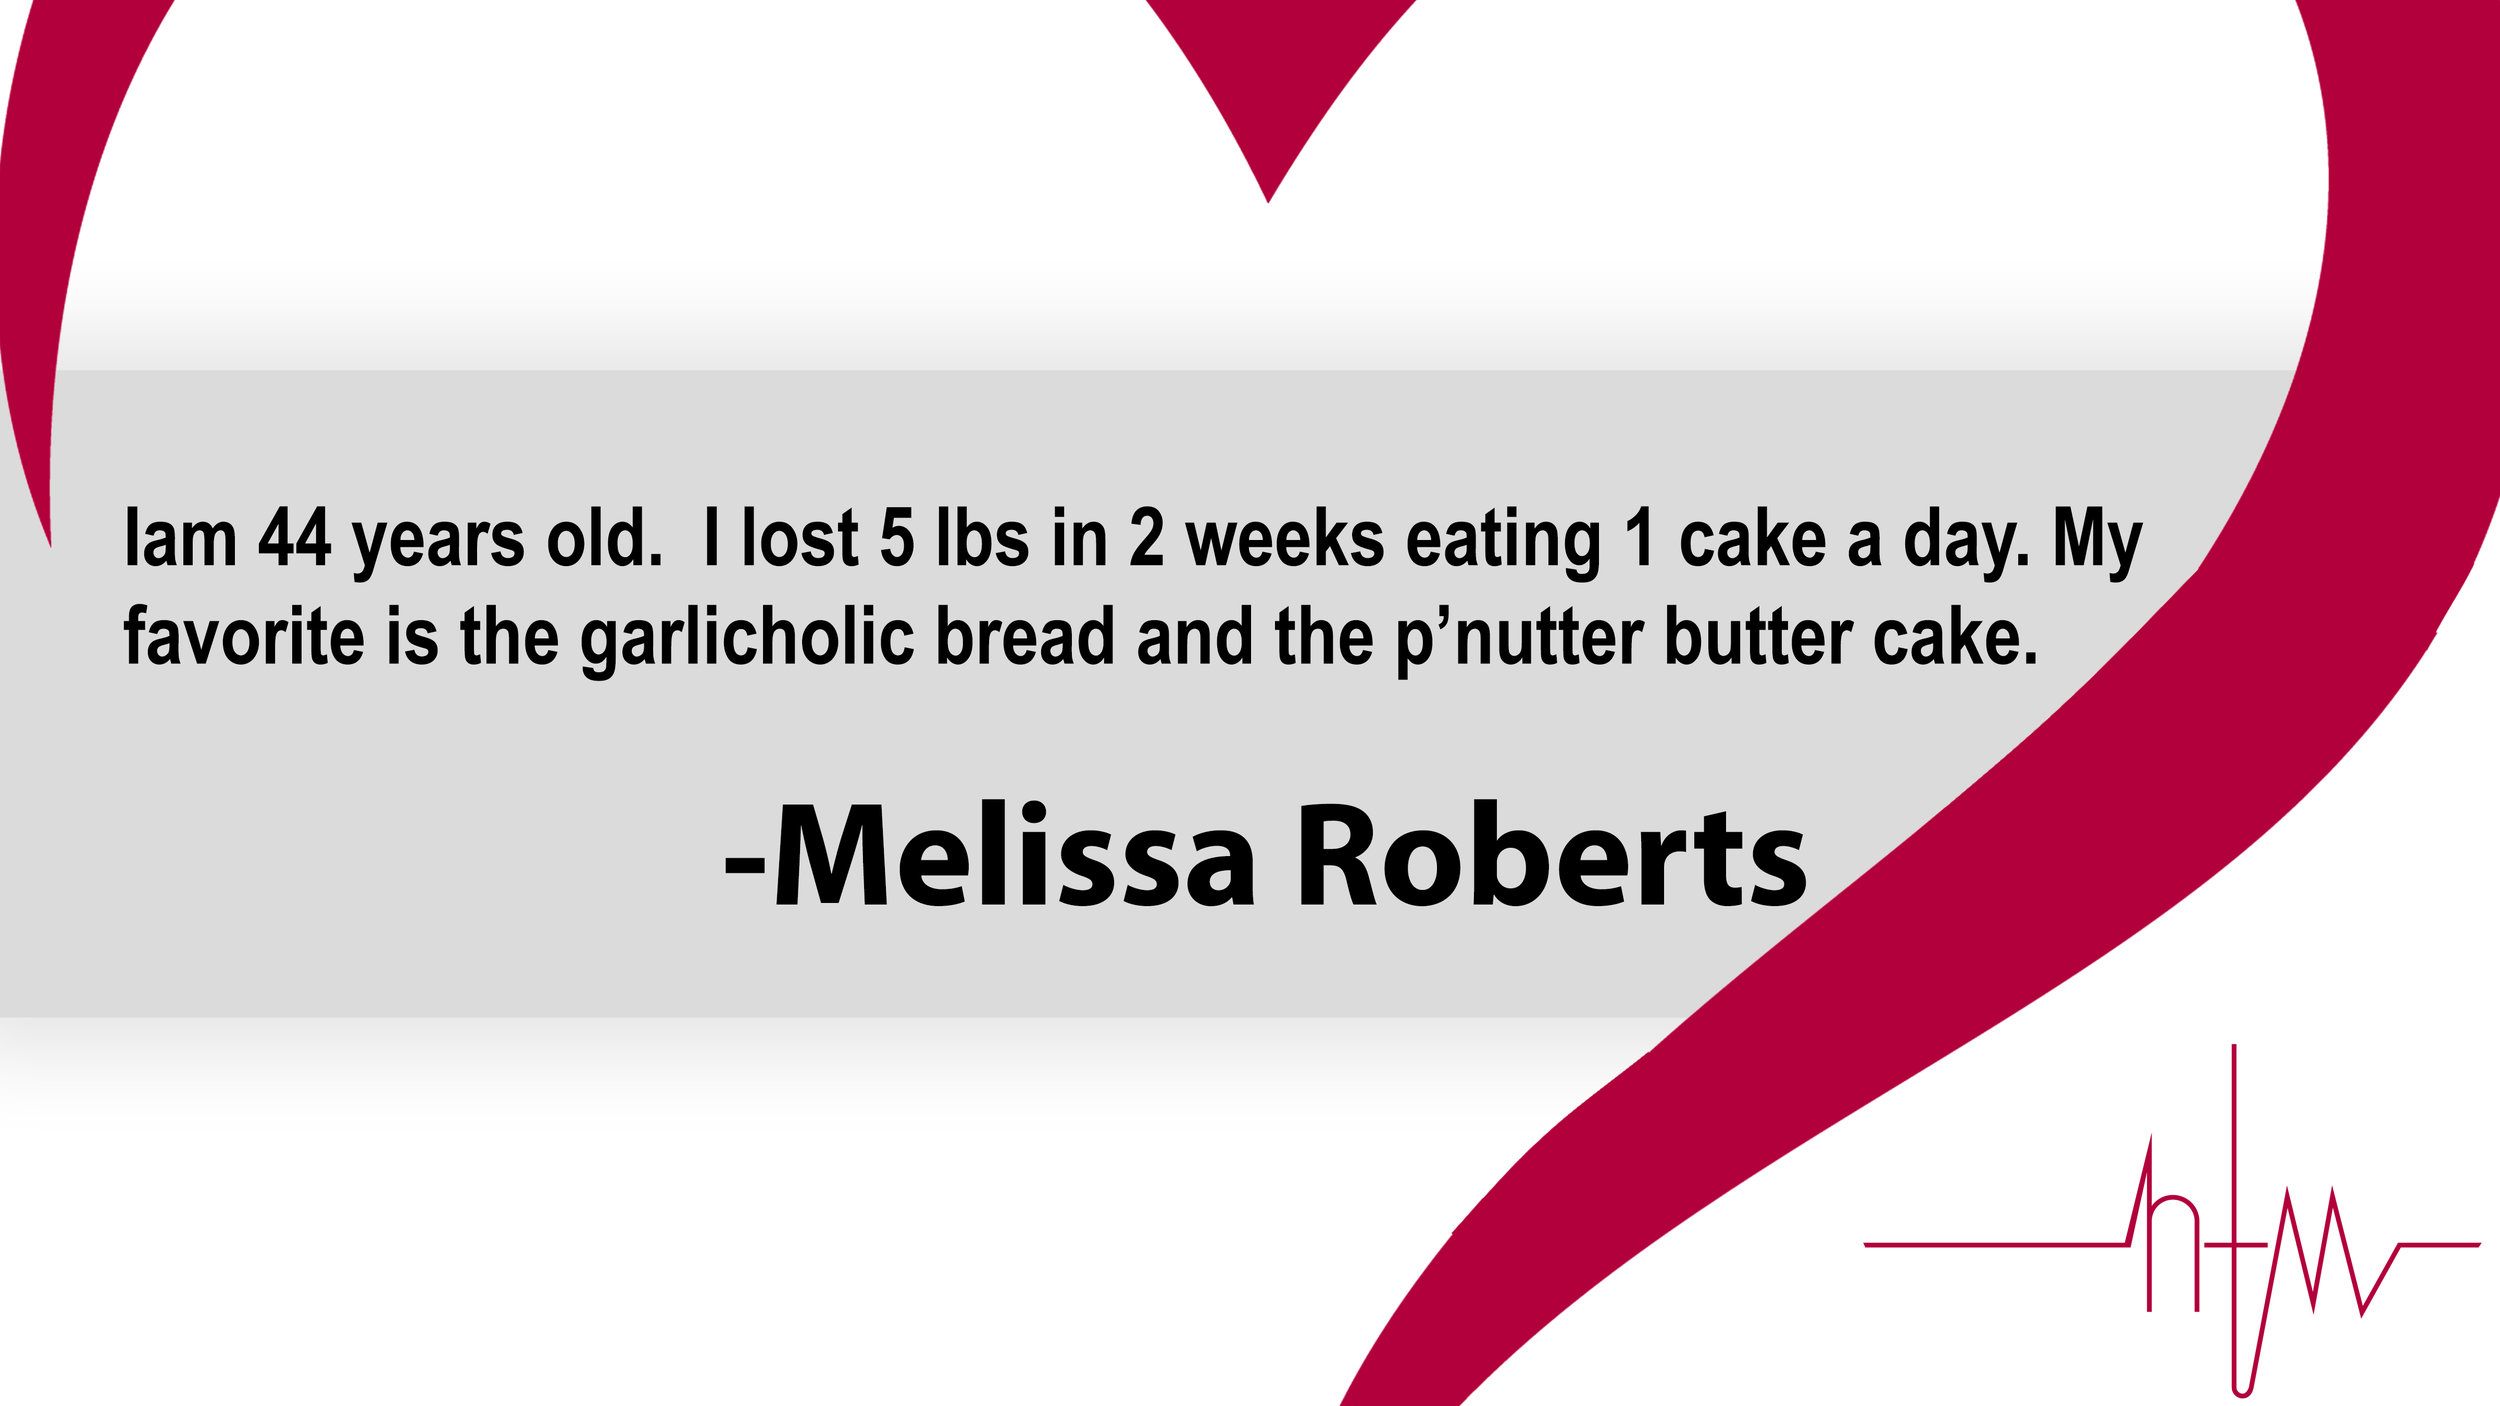 Melissa_Roberts_Testimony.jpg